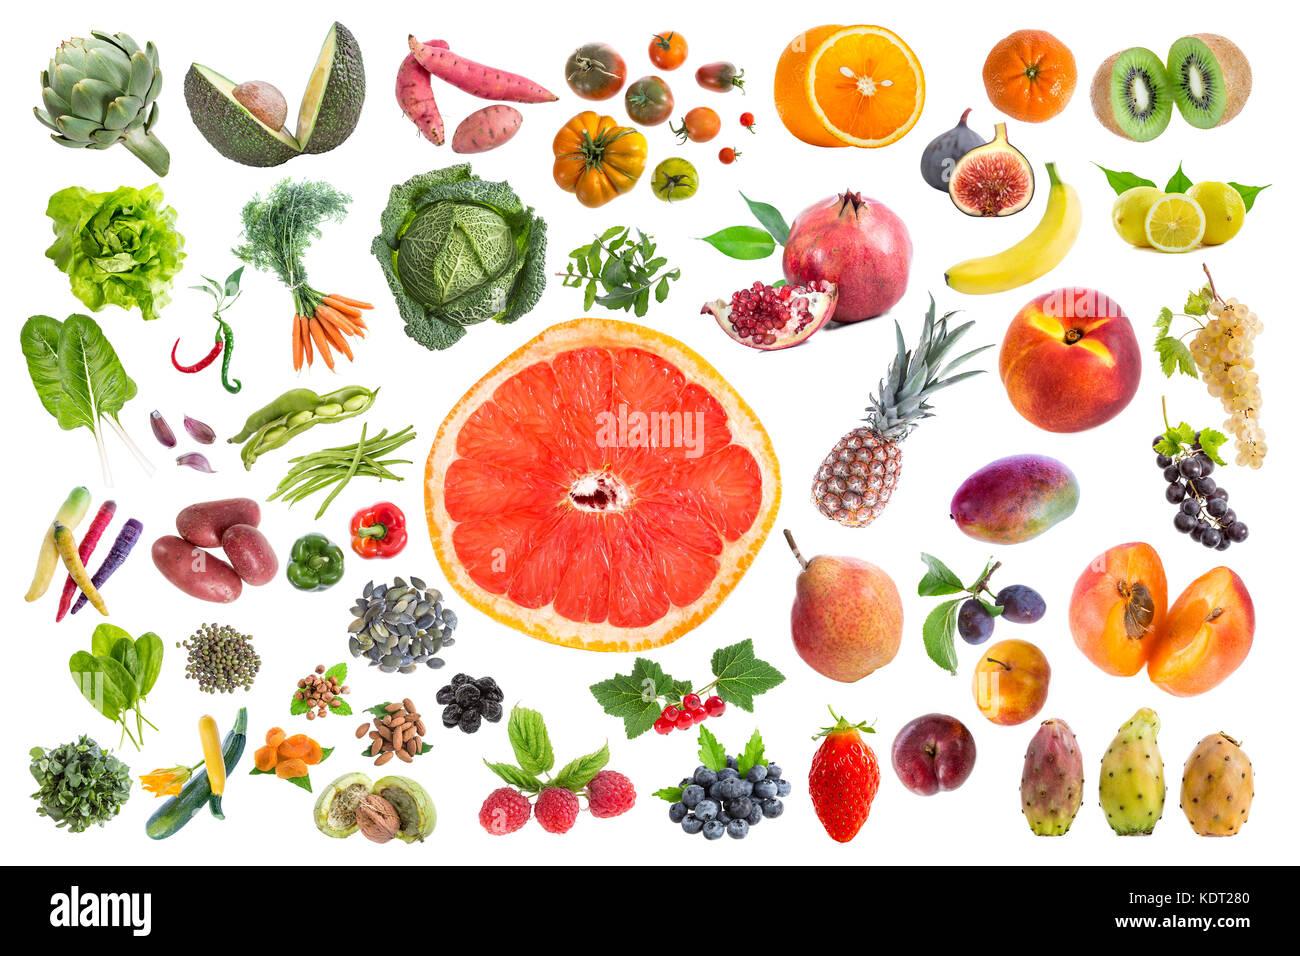 Concepto de alimentos sanos, diversas frutas y verduras para comer cinco un día de fondo con grapfruit withte Imagen De Stock